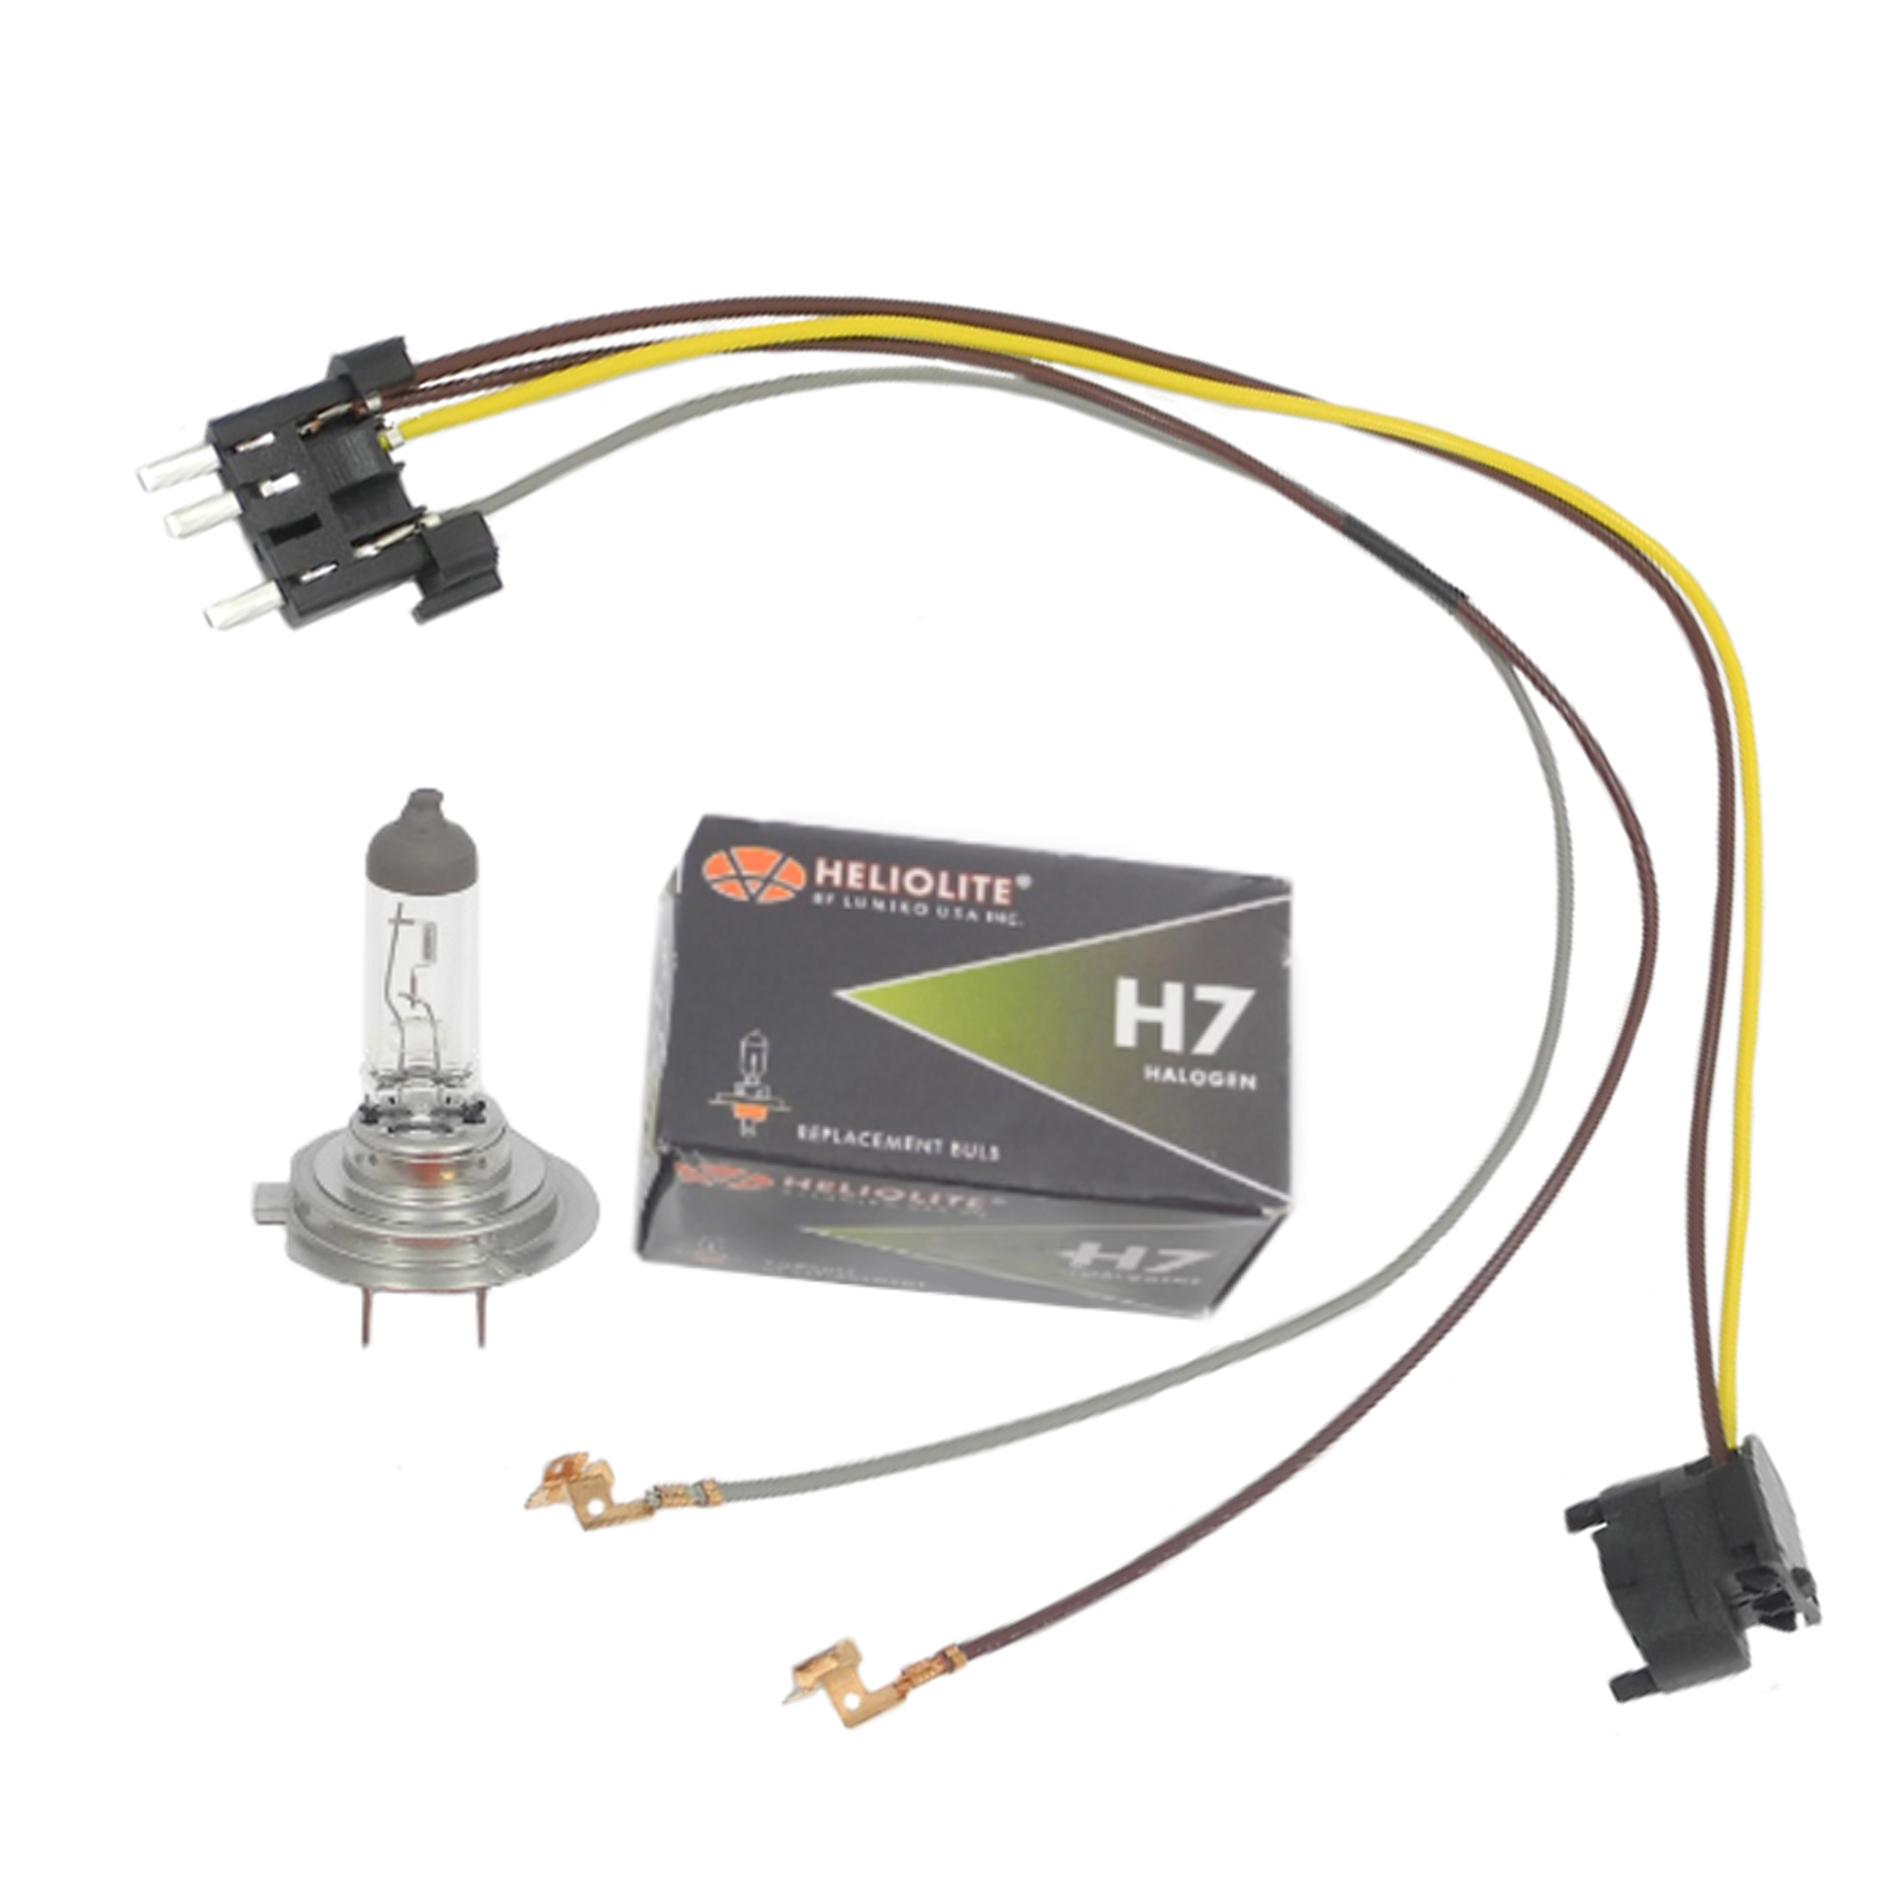 Fine Left Right Headlight Wiring Harness H7 55W Headlight Bulb For Wiring Digital Resources Anistprontobusorg